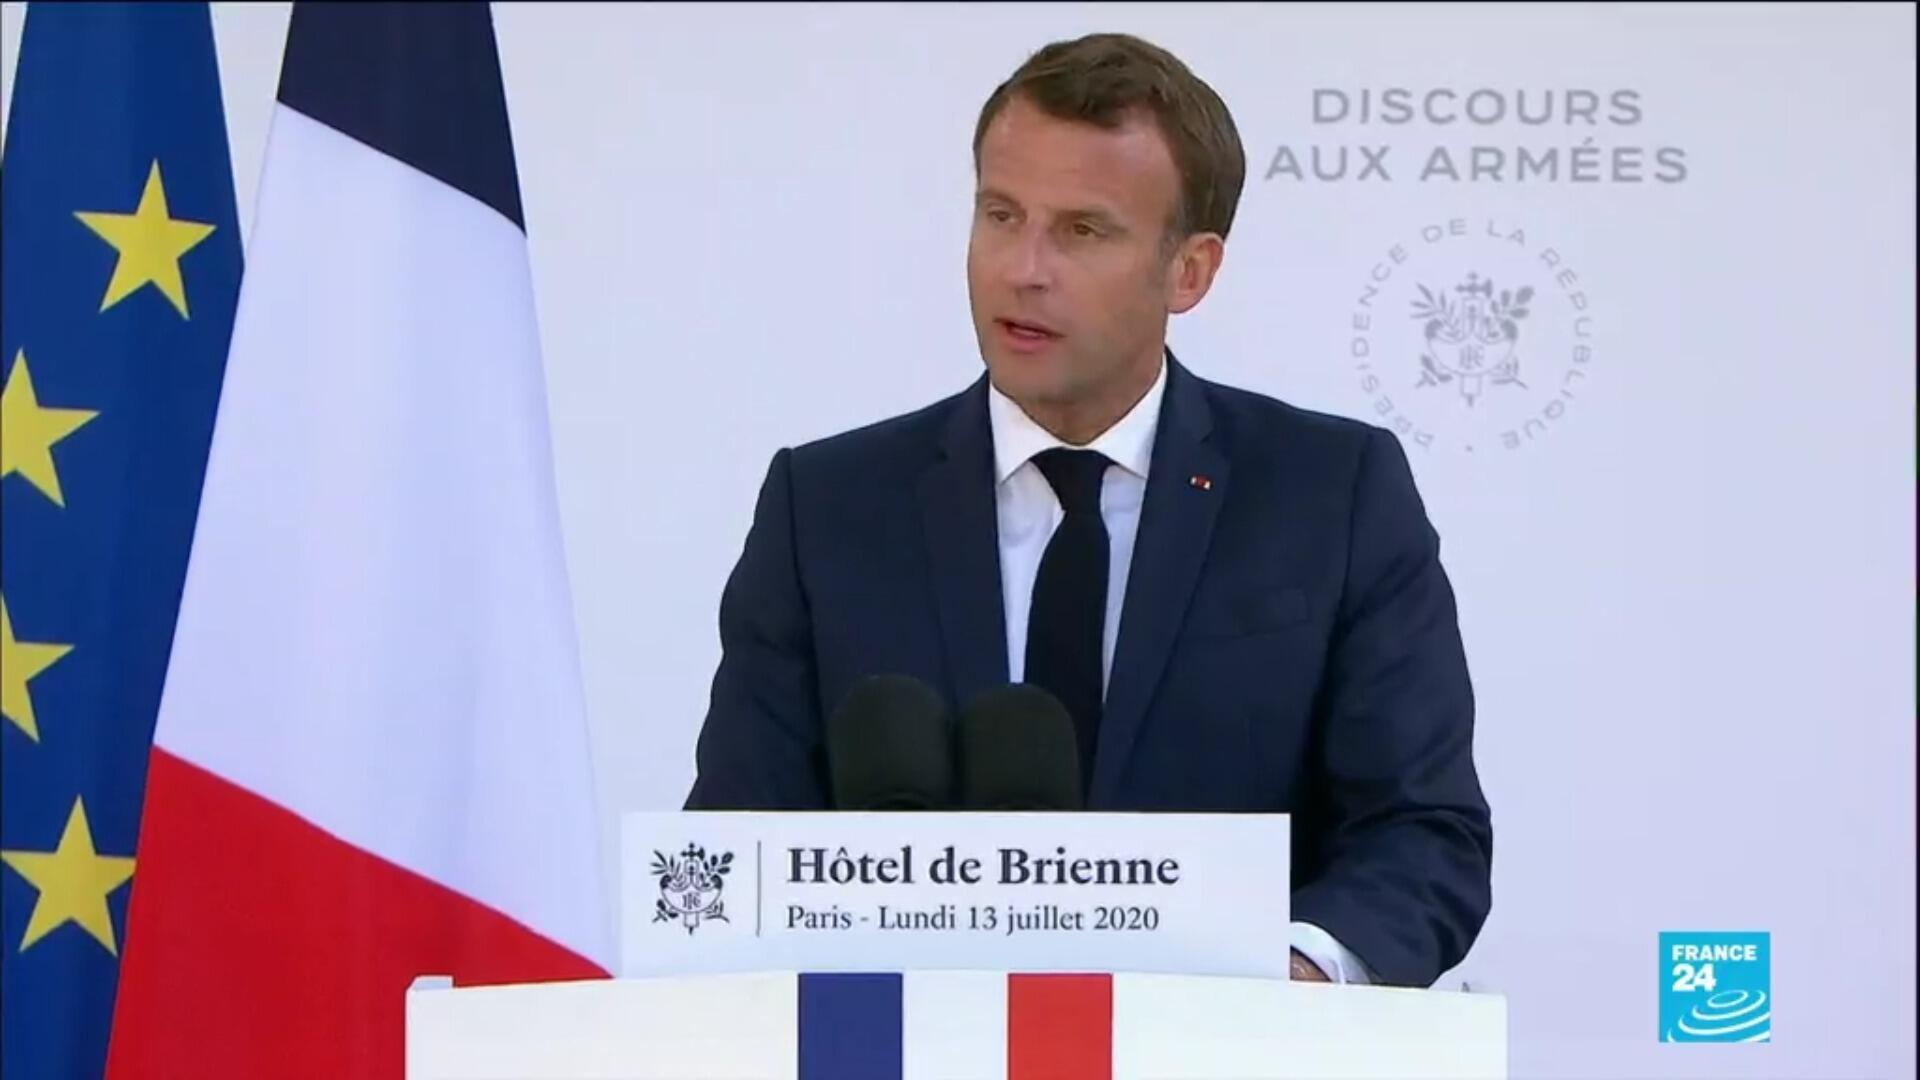 Macron speaks on the eve of Bastille Day